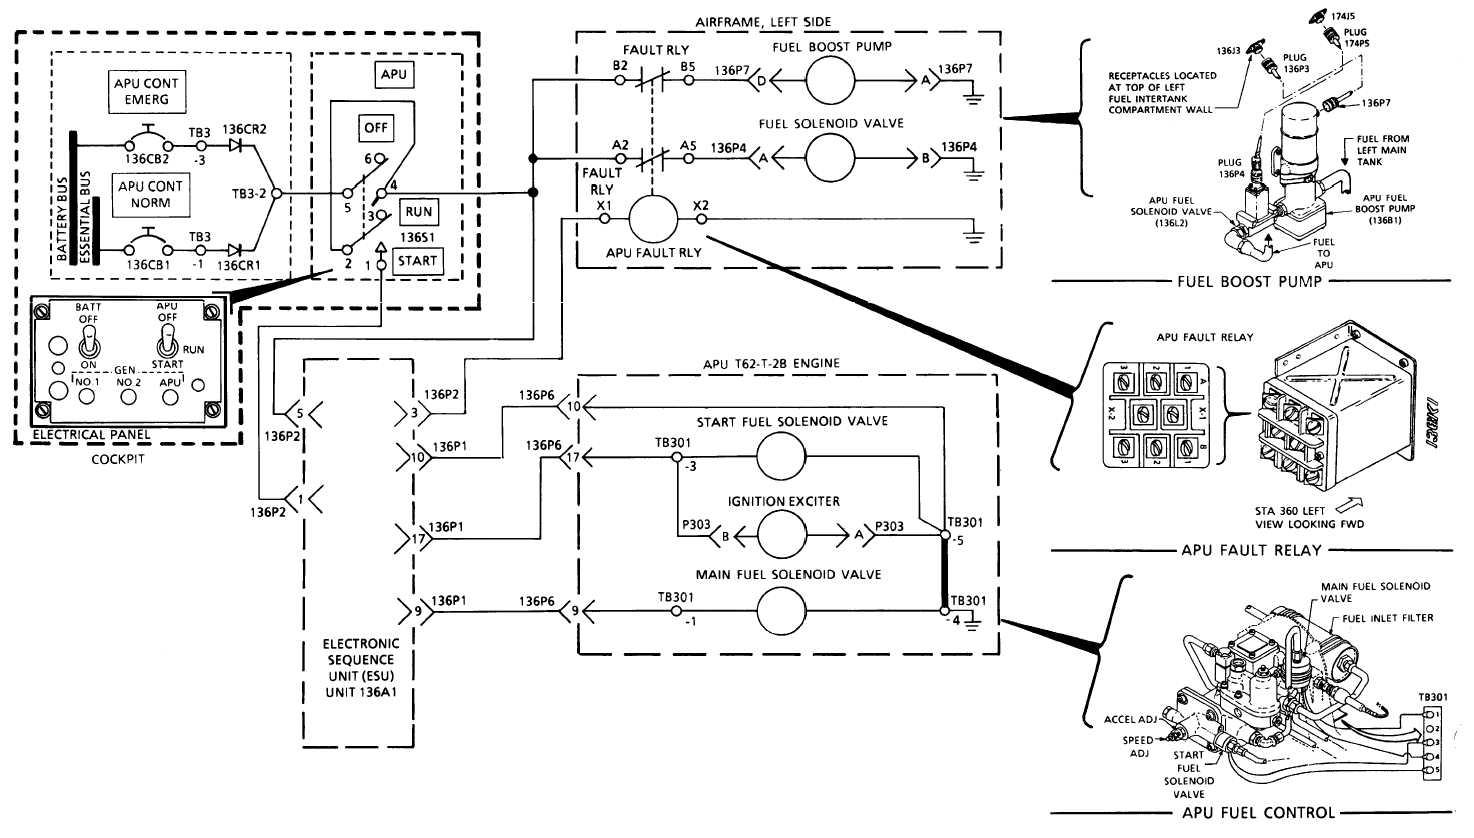 Apu Fuel System Electrical Schematic